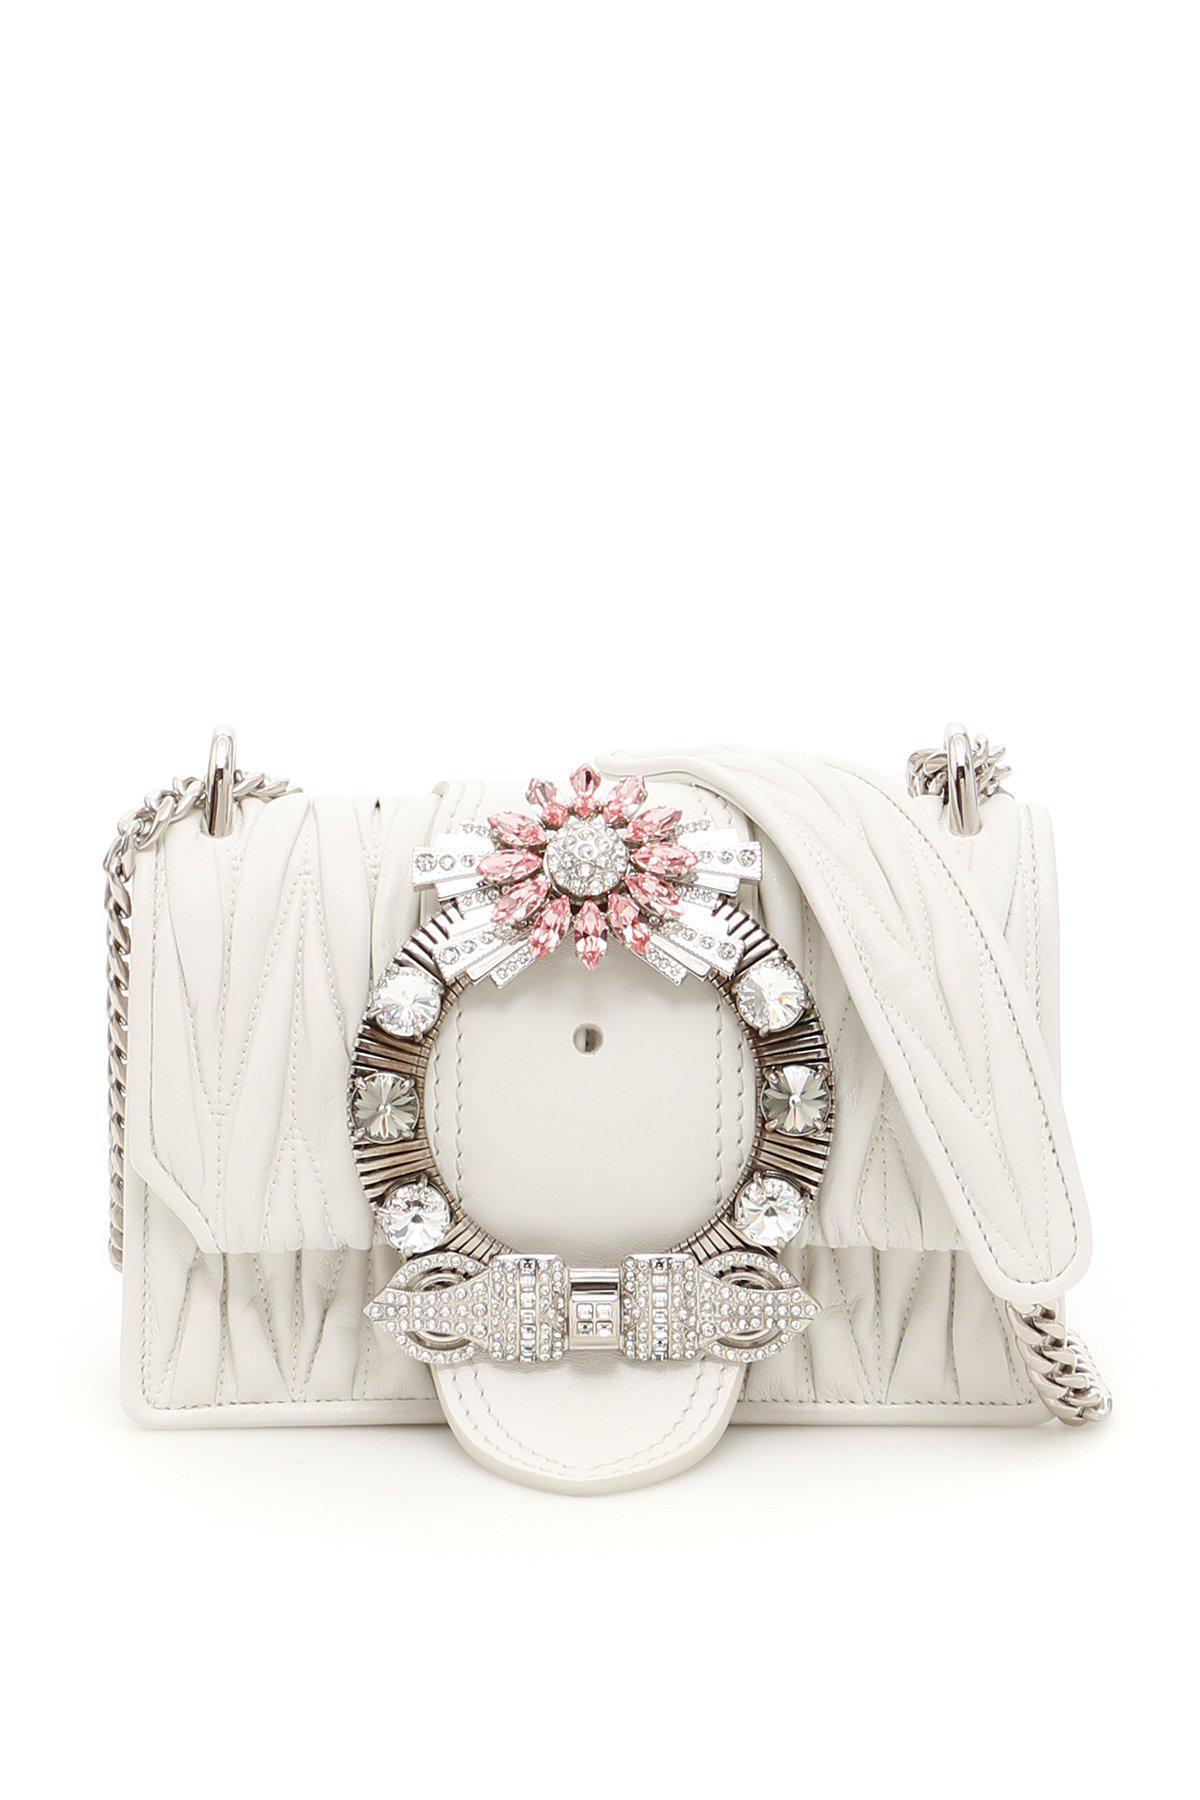 Lyst - Miu Miu Miu Lady Embellished Buckle Shoulder Bag in White 8eb5ce5070